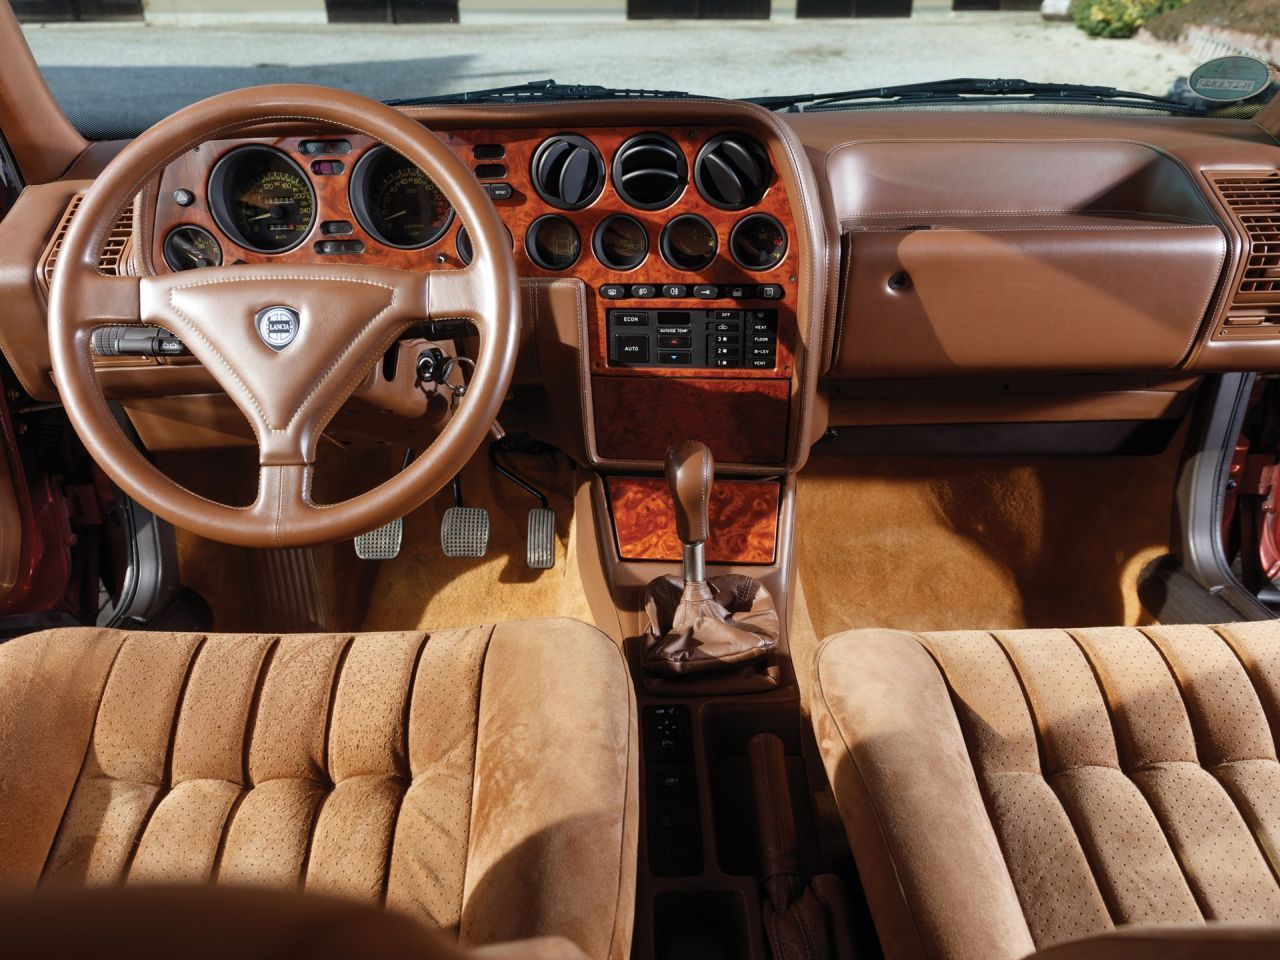 Lancia Thema 8.32 de 1991 - Costard, champagne... Et frustration ! 33